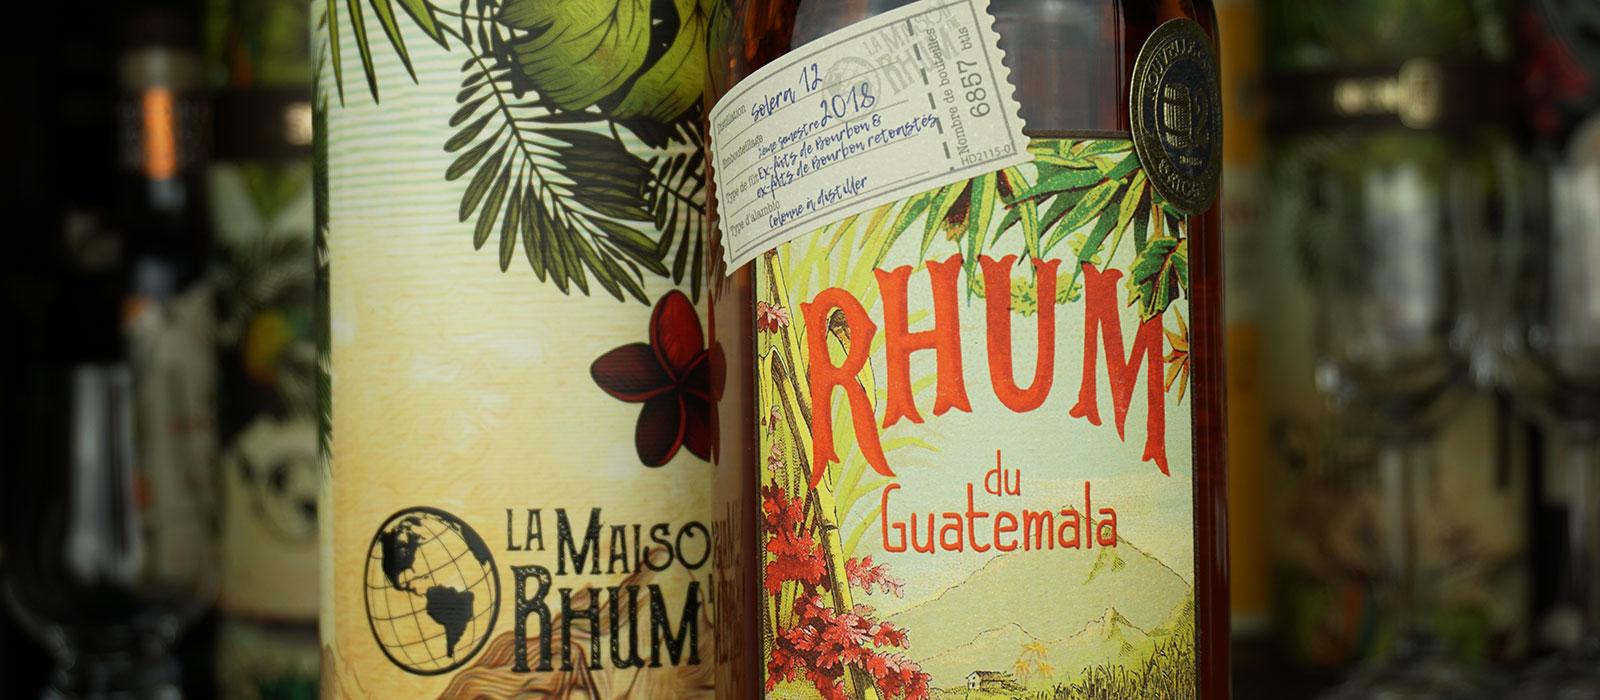 Sjätte plats 2020: La Maison du Rhum Guatemala Batch 2